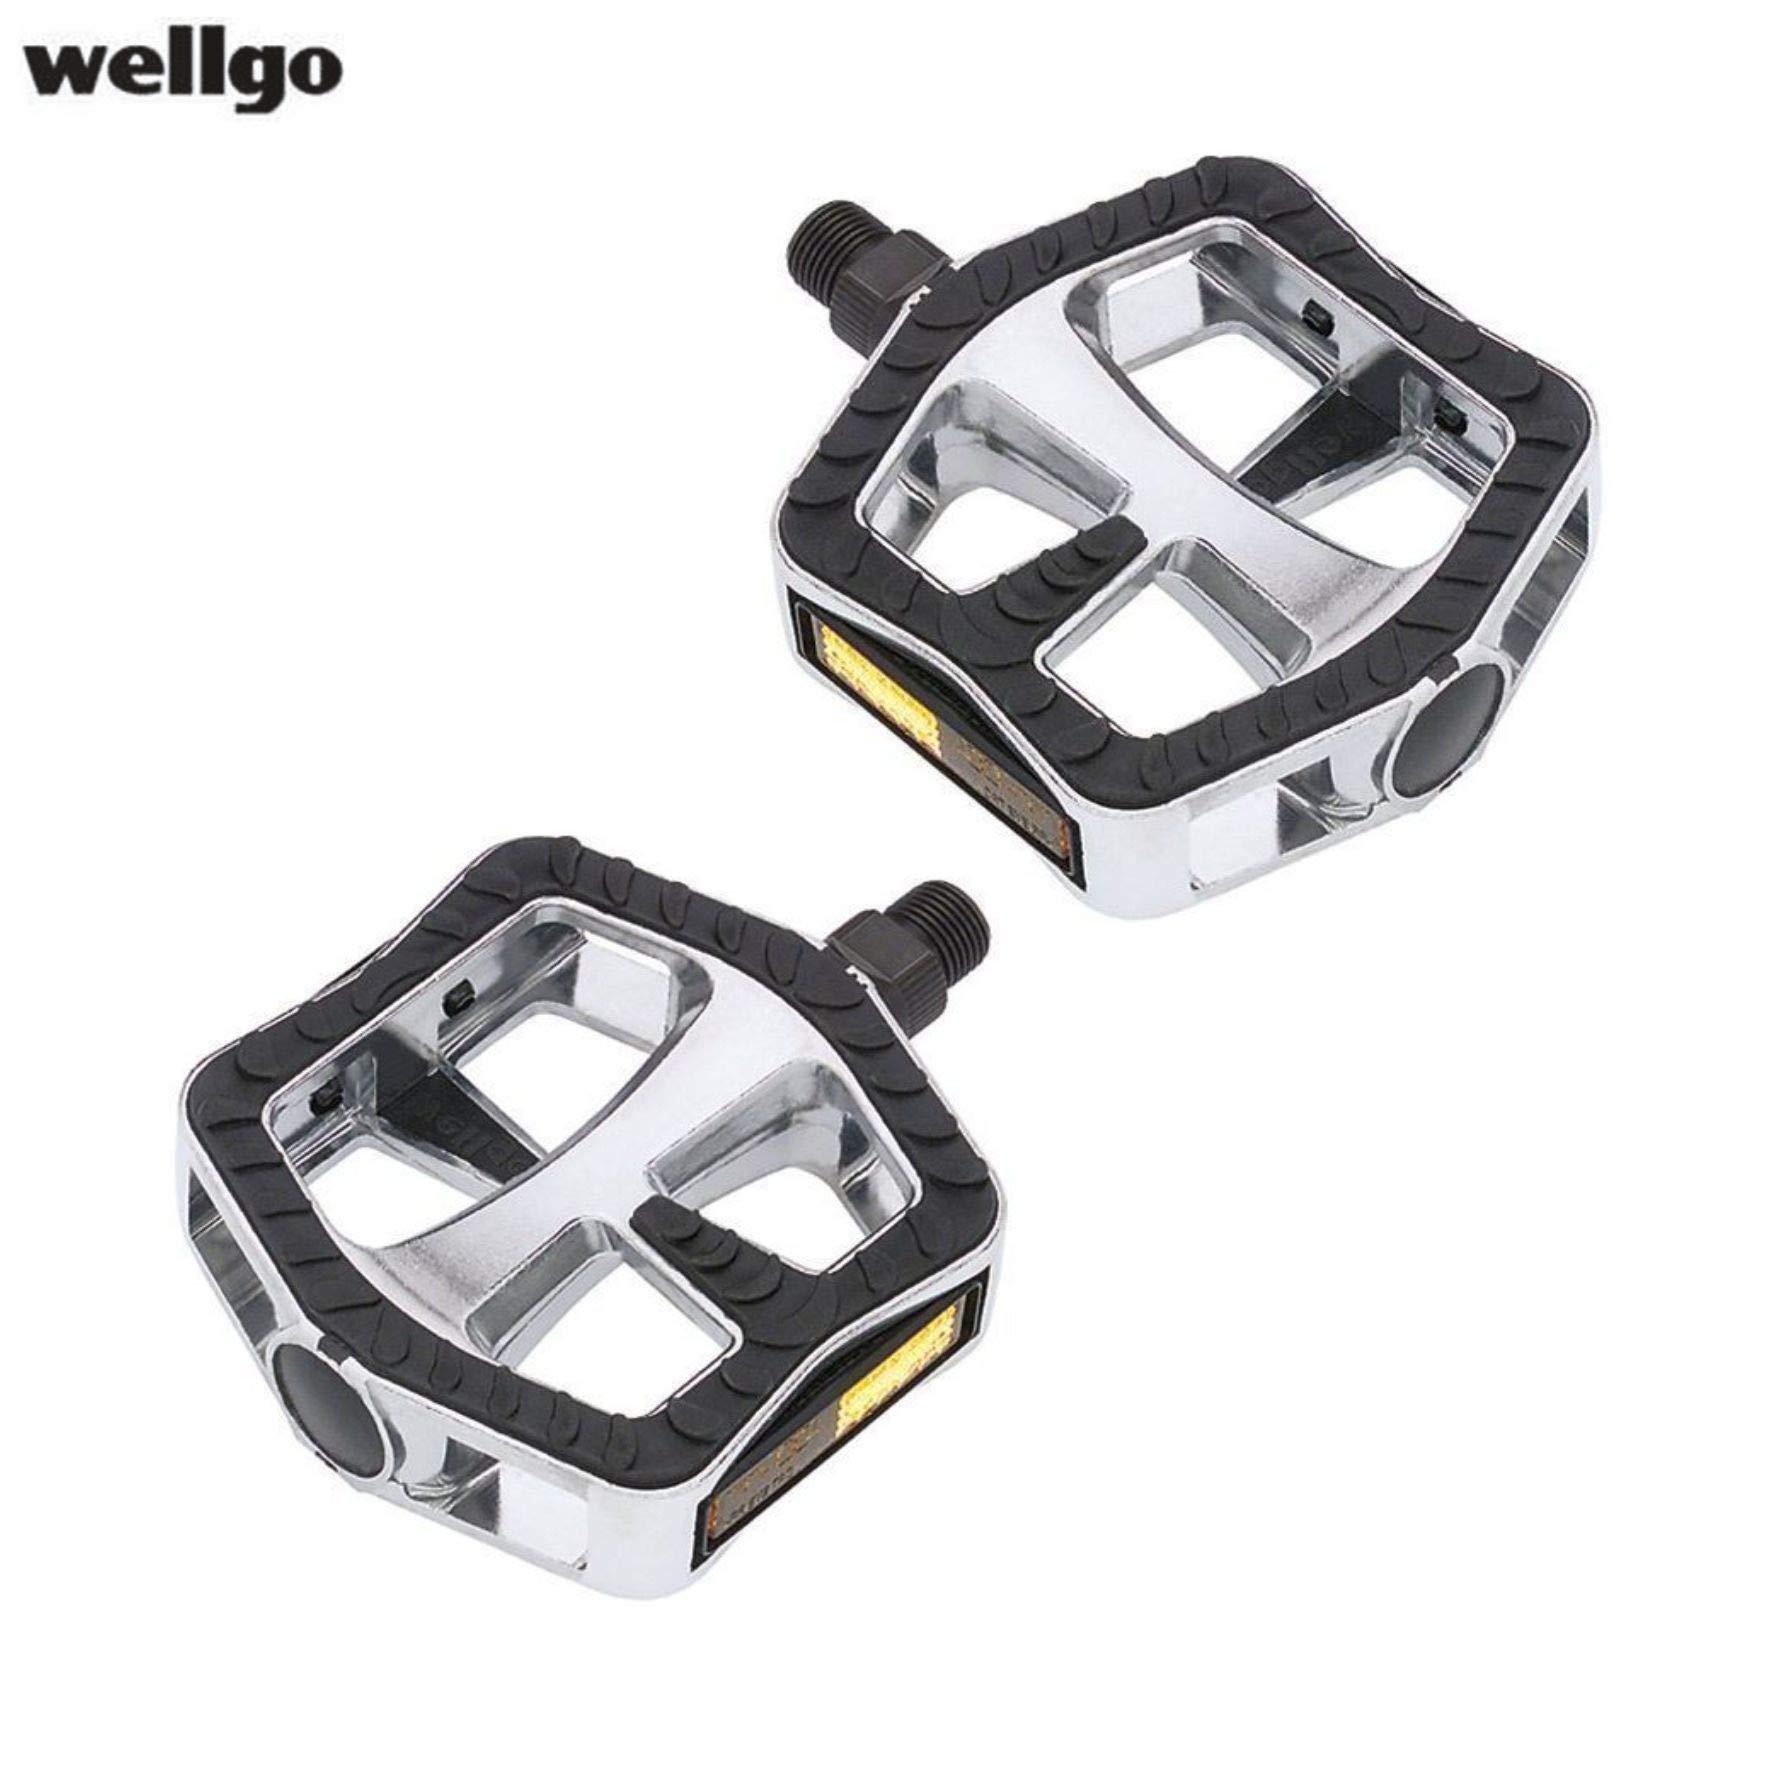 Wellgo R251DU Aluminum Road Bike Pedal White